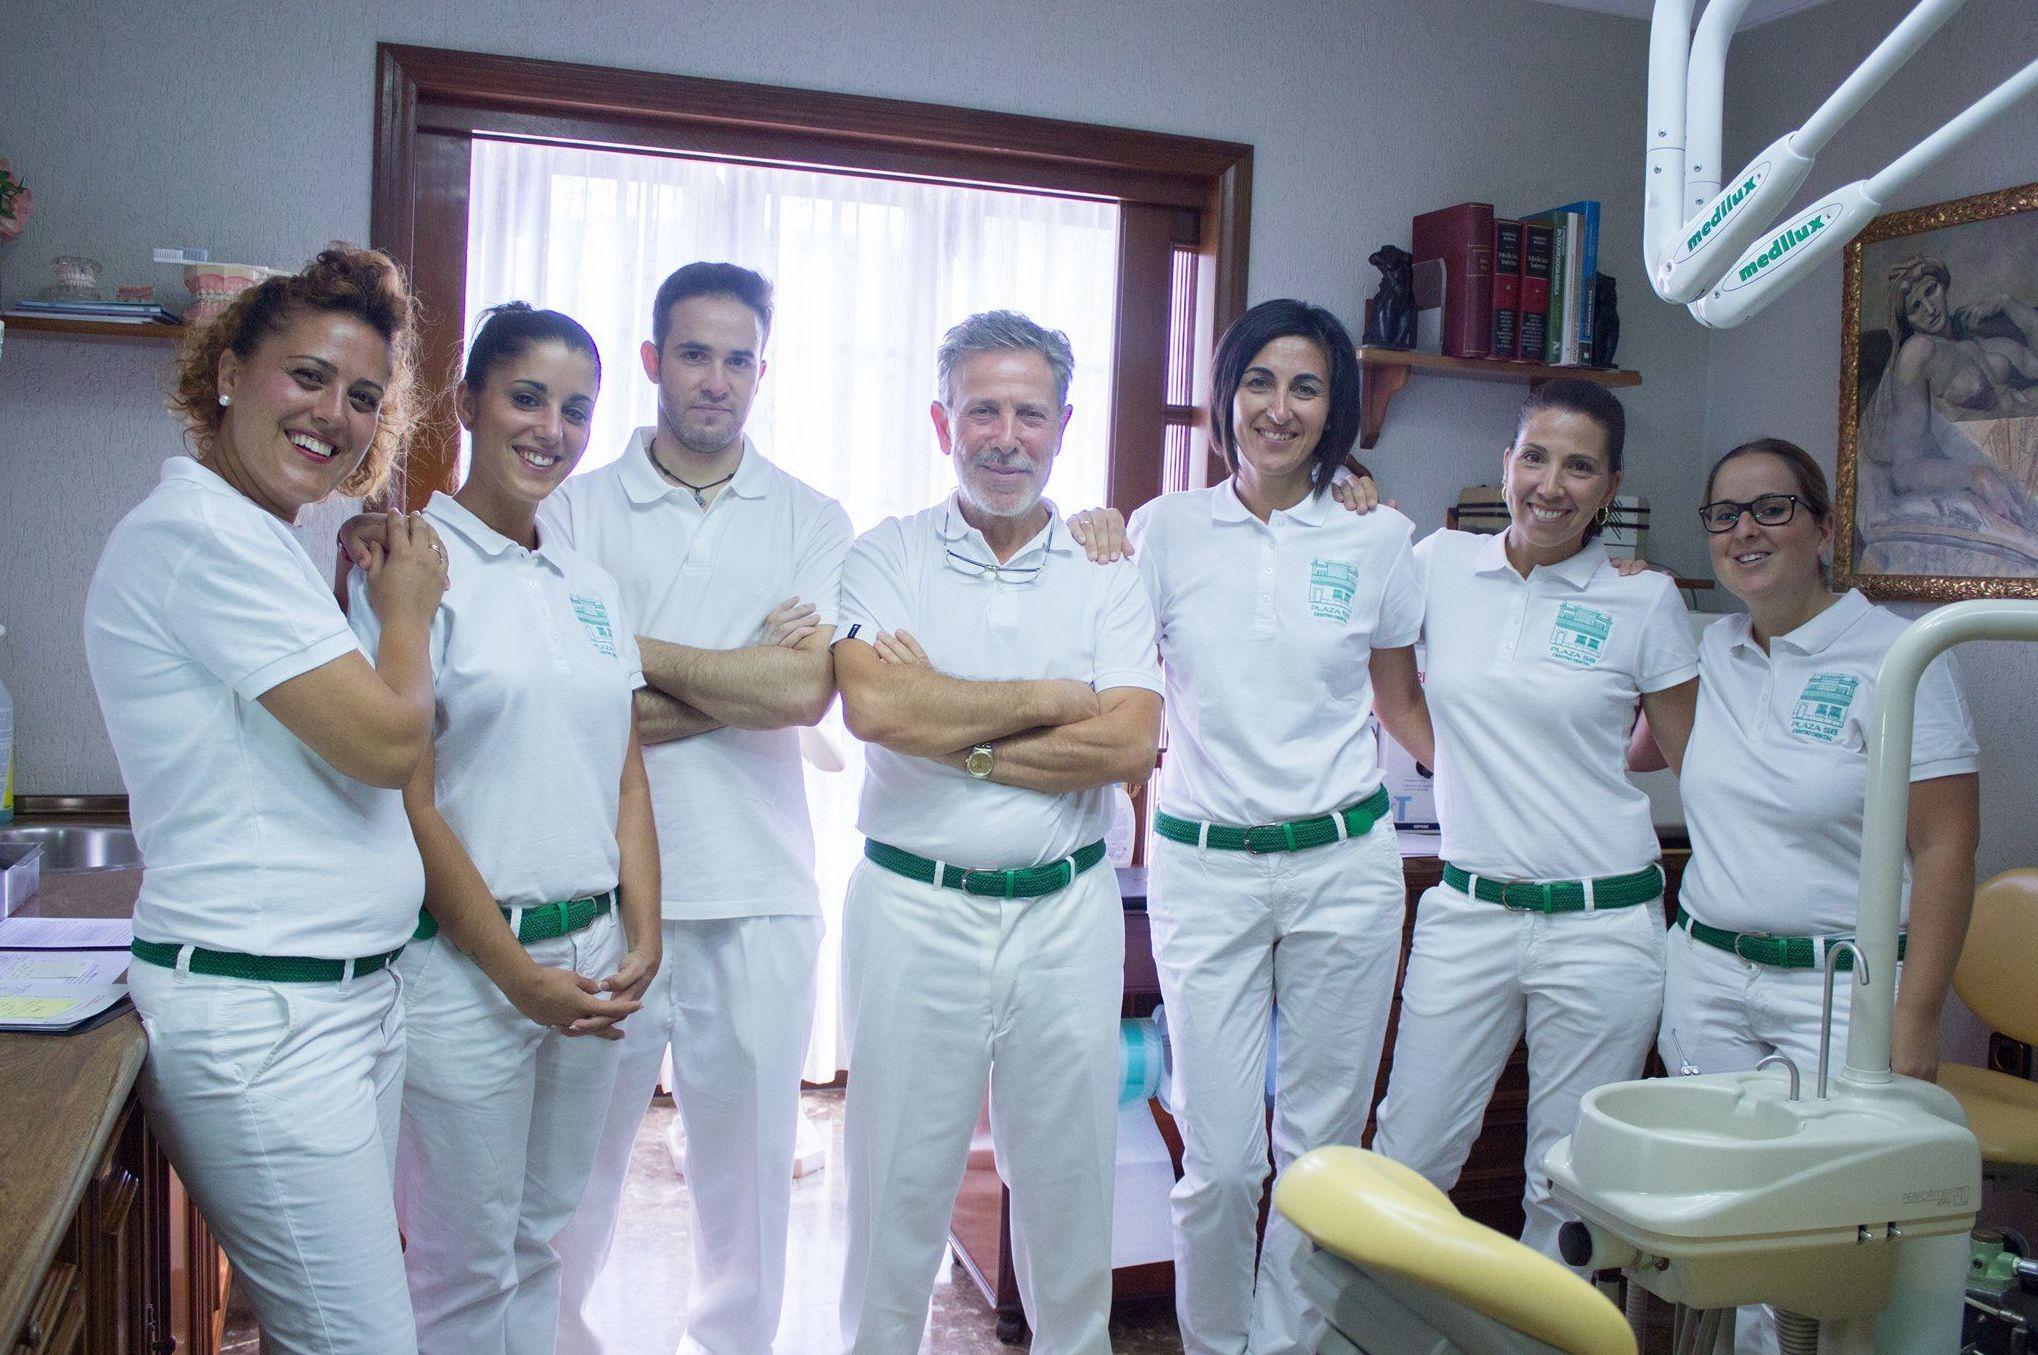 Centro Dental Plaza 58 ( Dr. Pedro Fernandez Lorente )